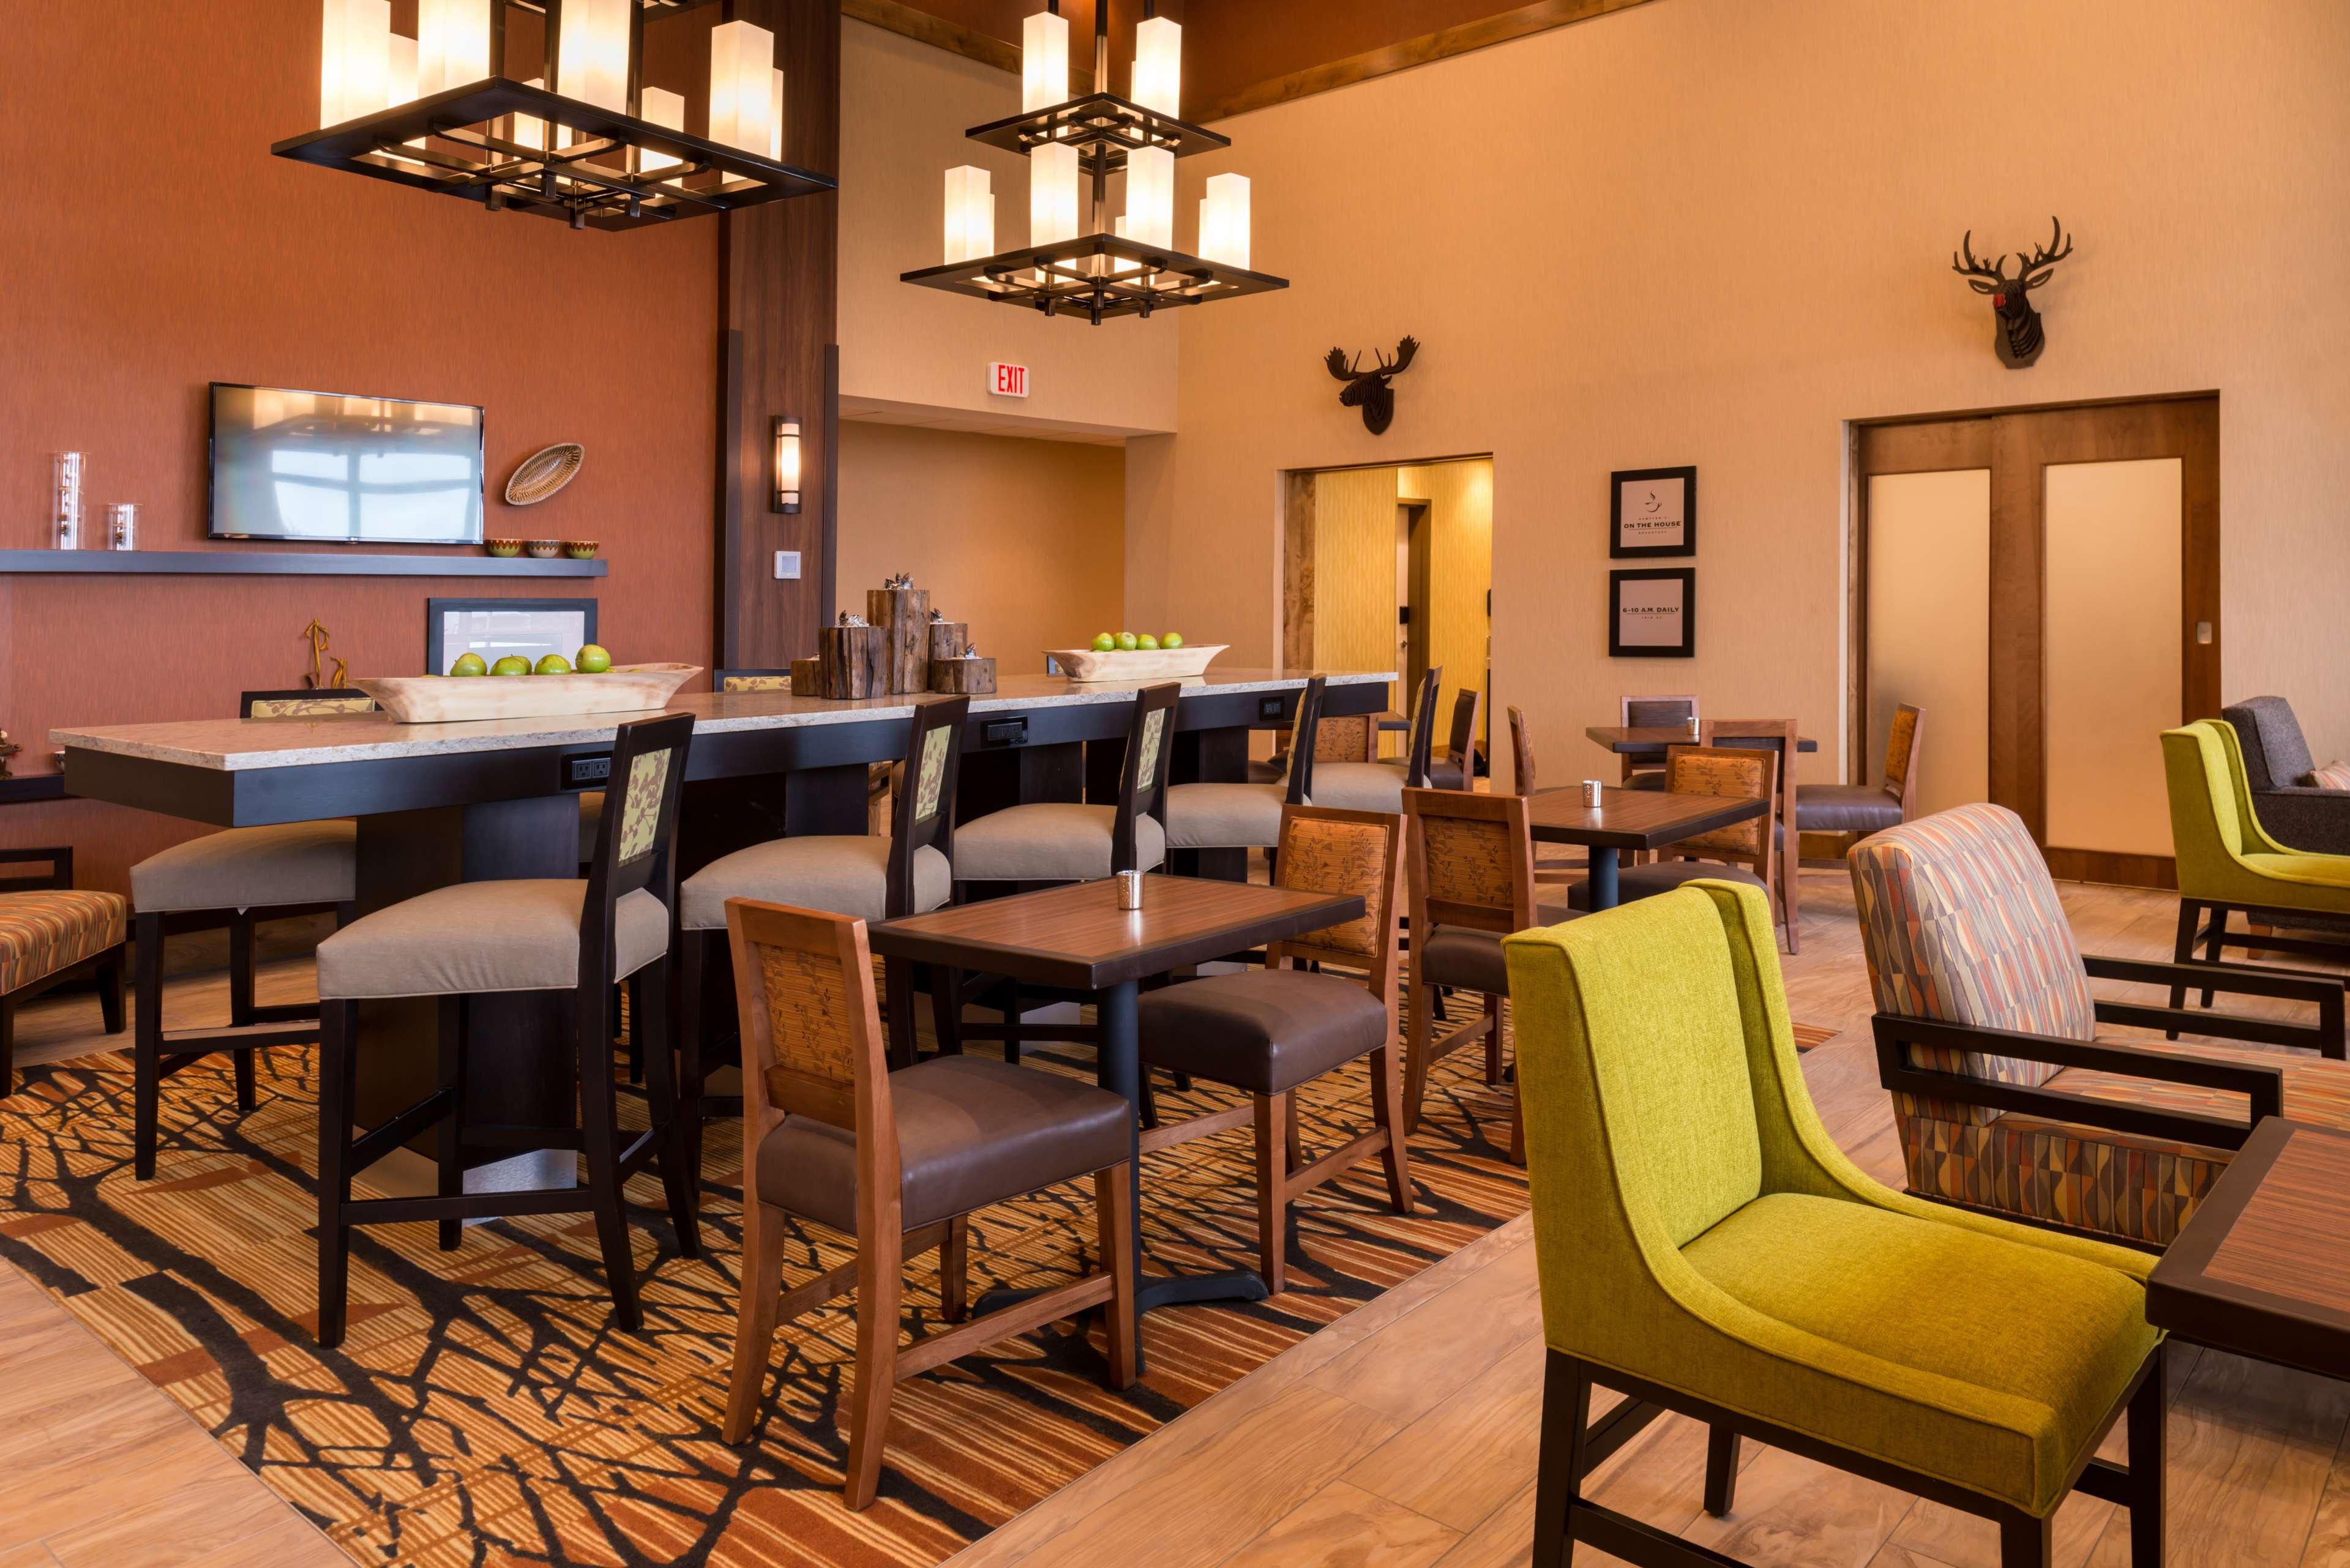 Hampton Inn & Suites Silverthorne image 11